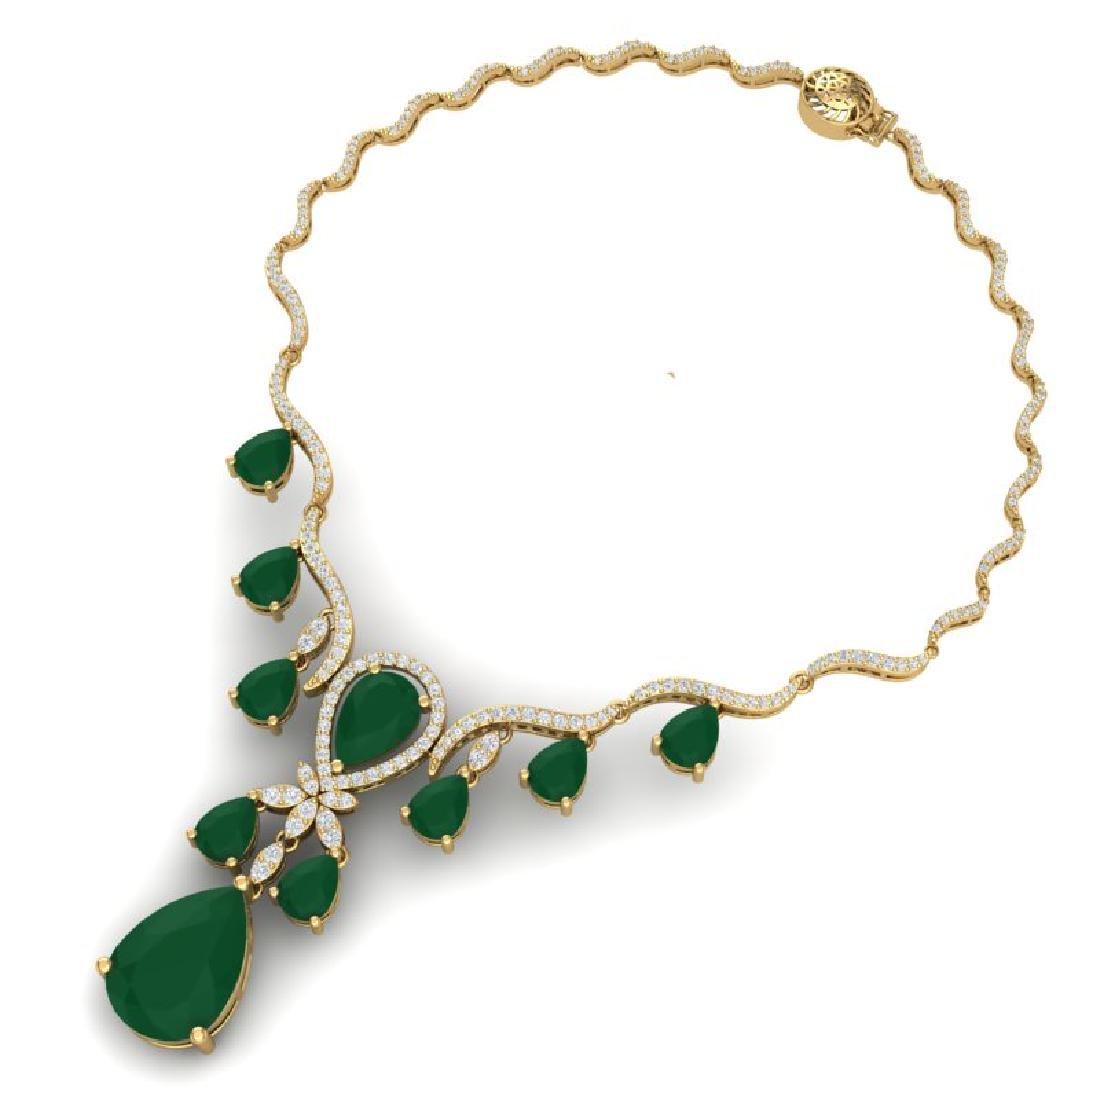 36.14 CTW Royalty Emerald & VS Diamond Necklace 18K - 3